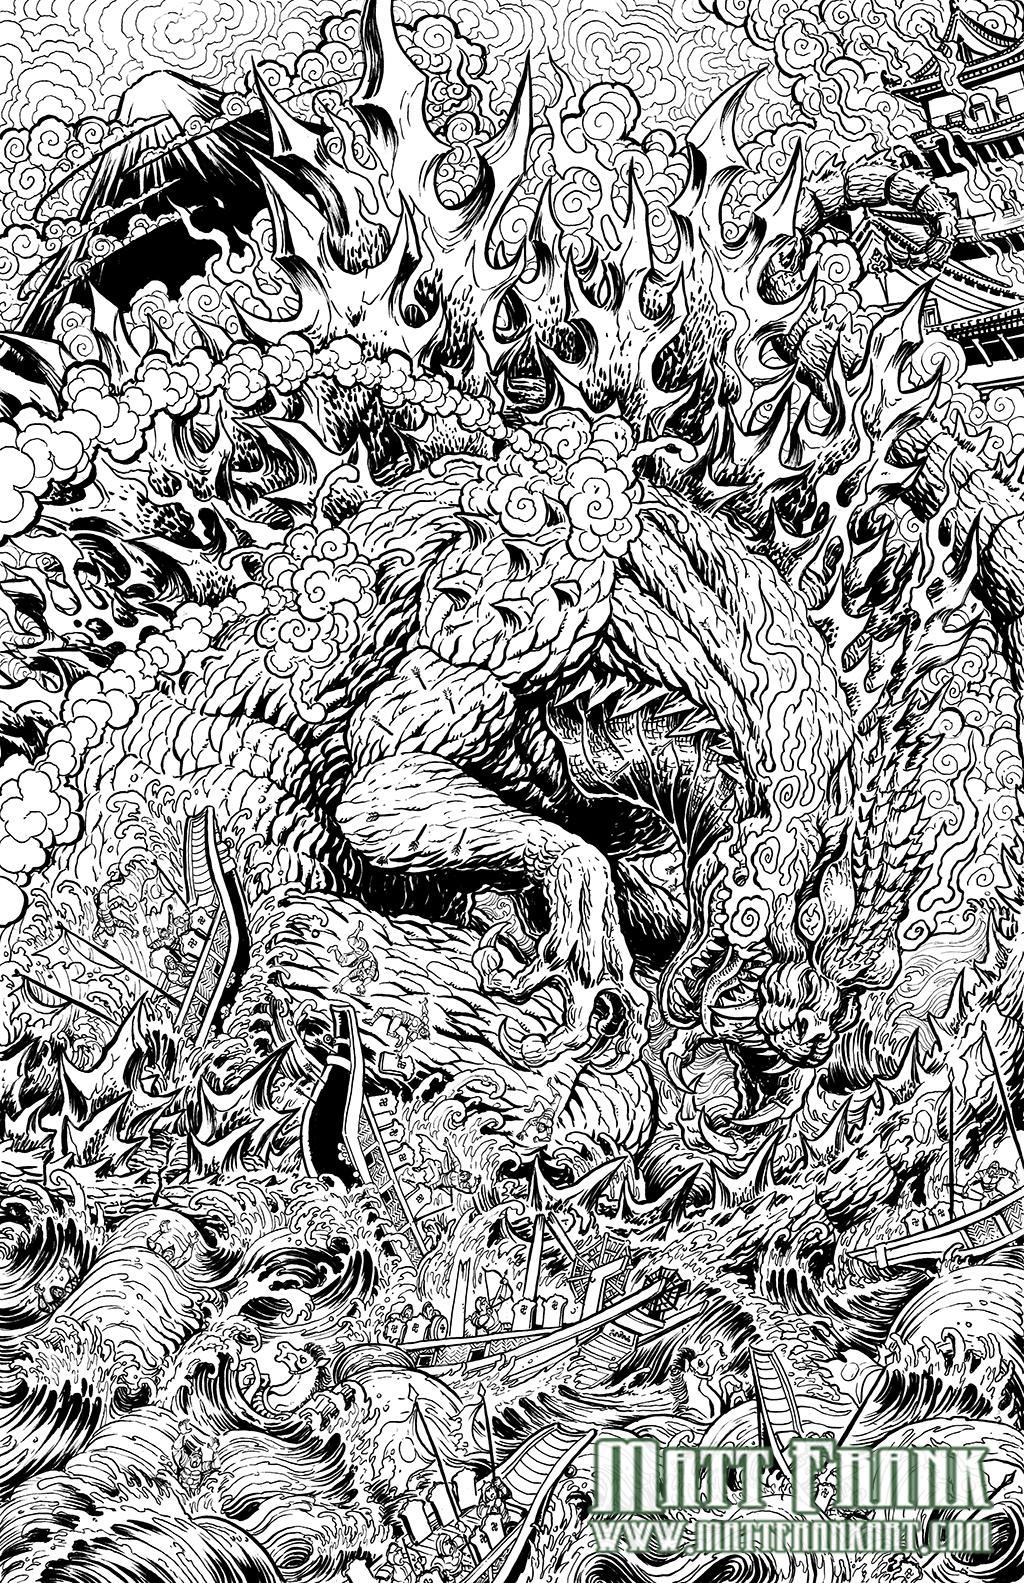 Godzilla: Rage Across Time #1 line art